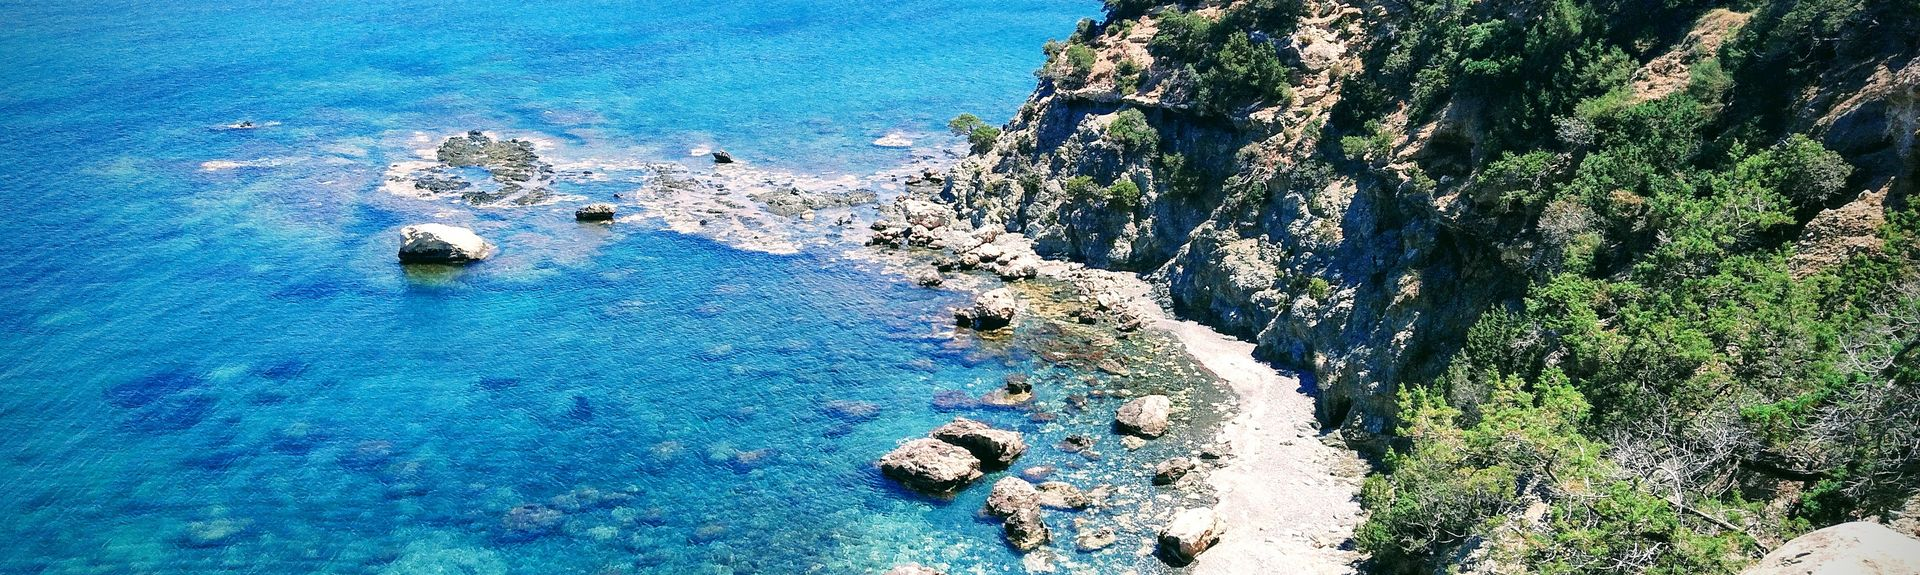 Melissovouno, Tala, Πάφος, Κύπρος